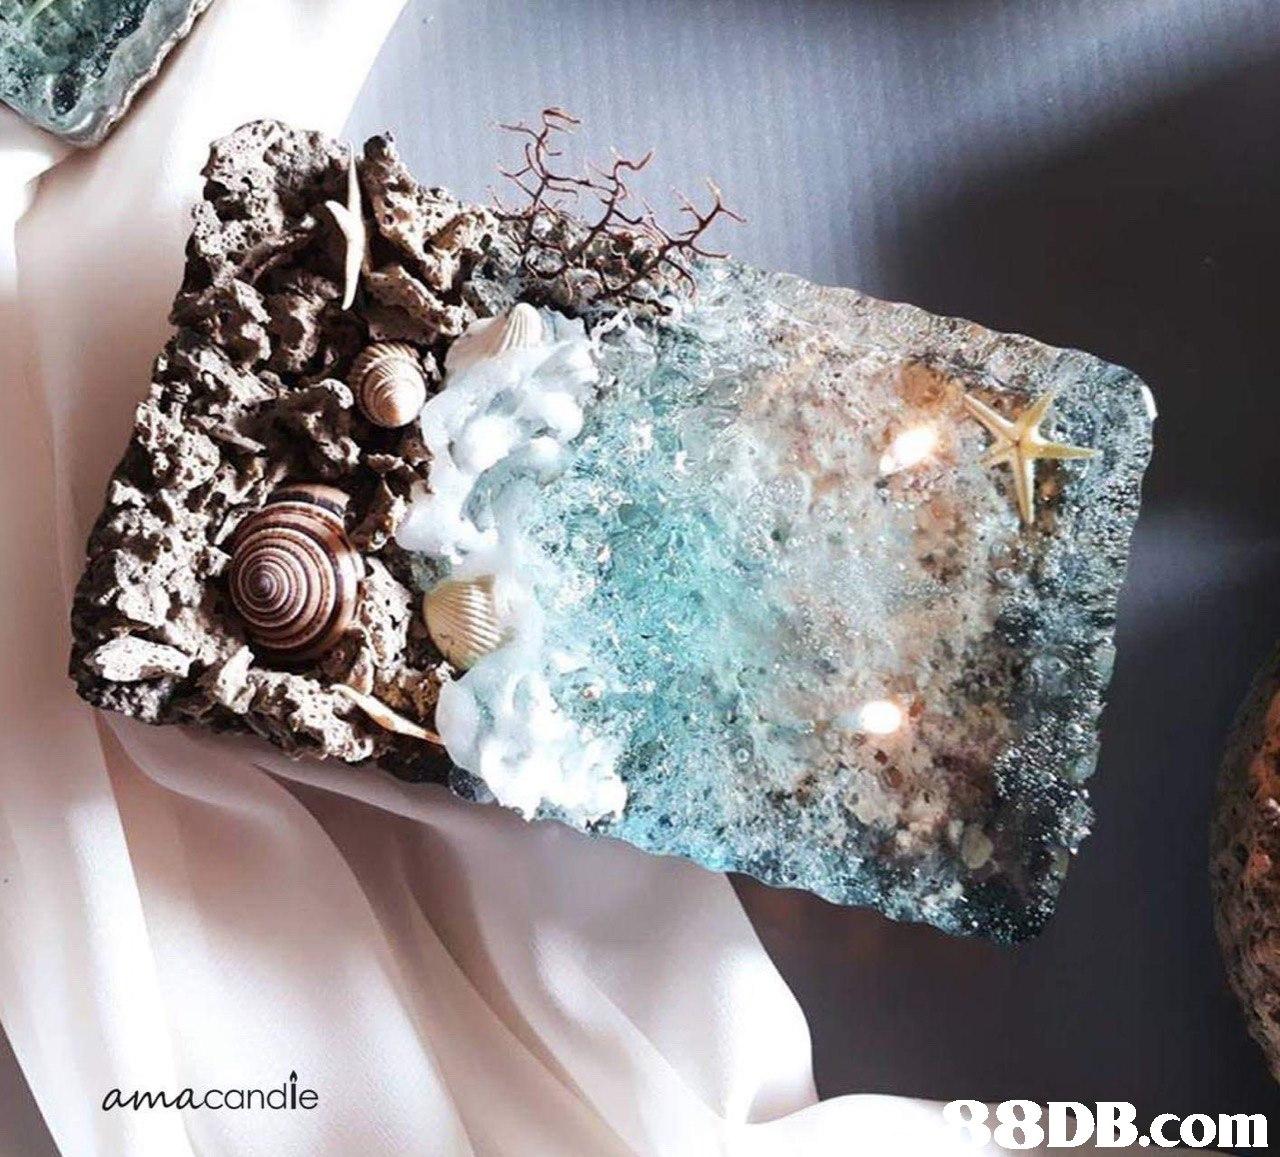 amacandle 8DB.com  jewellery